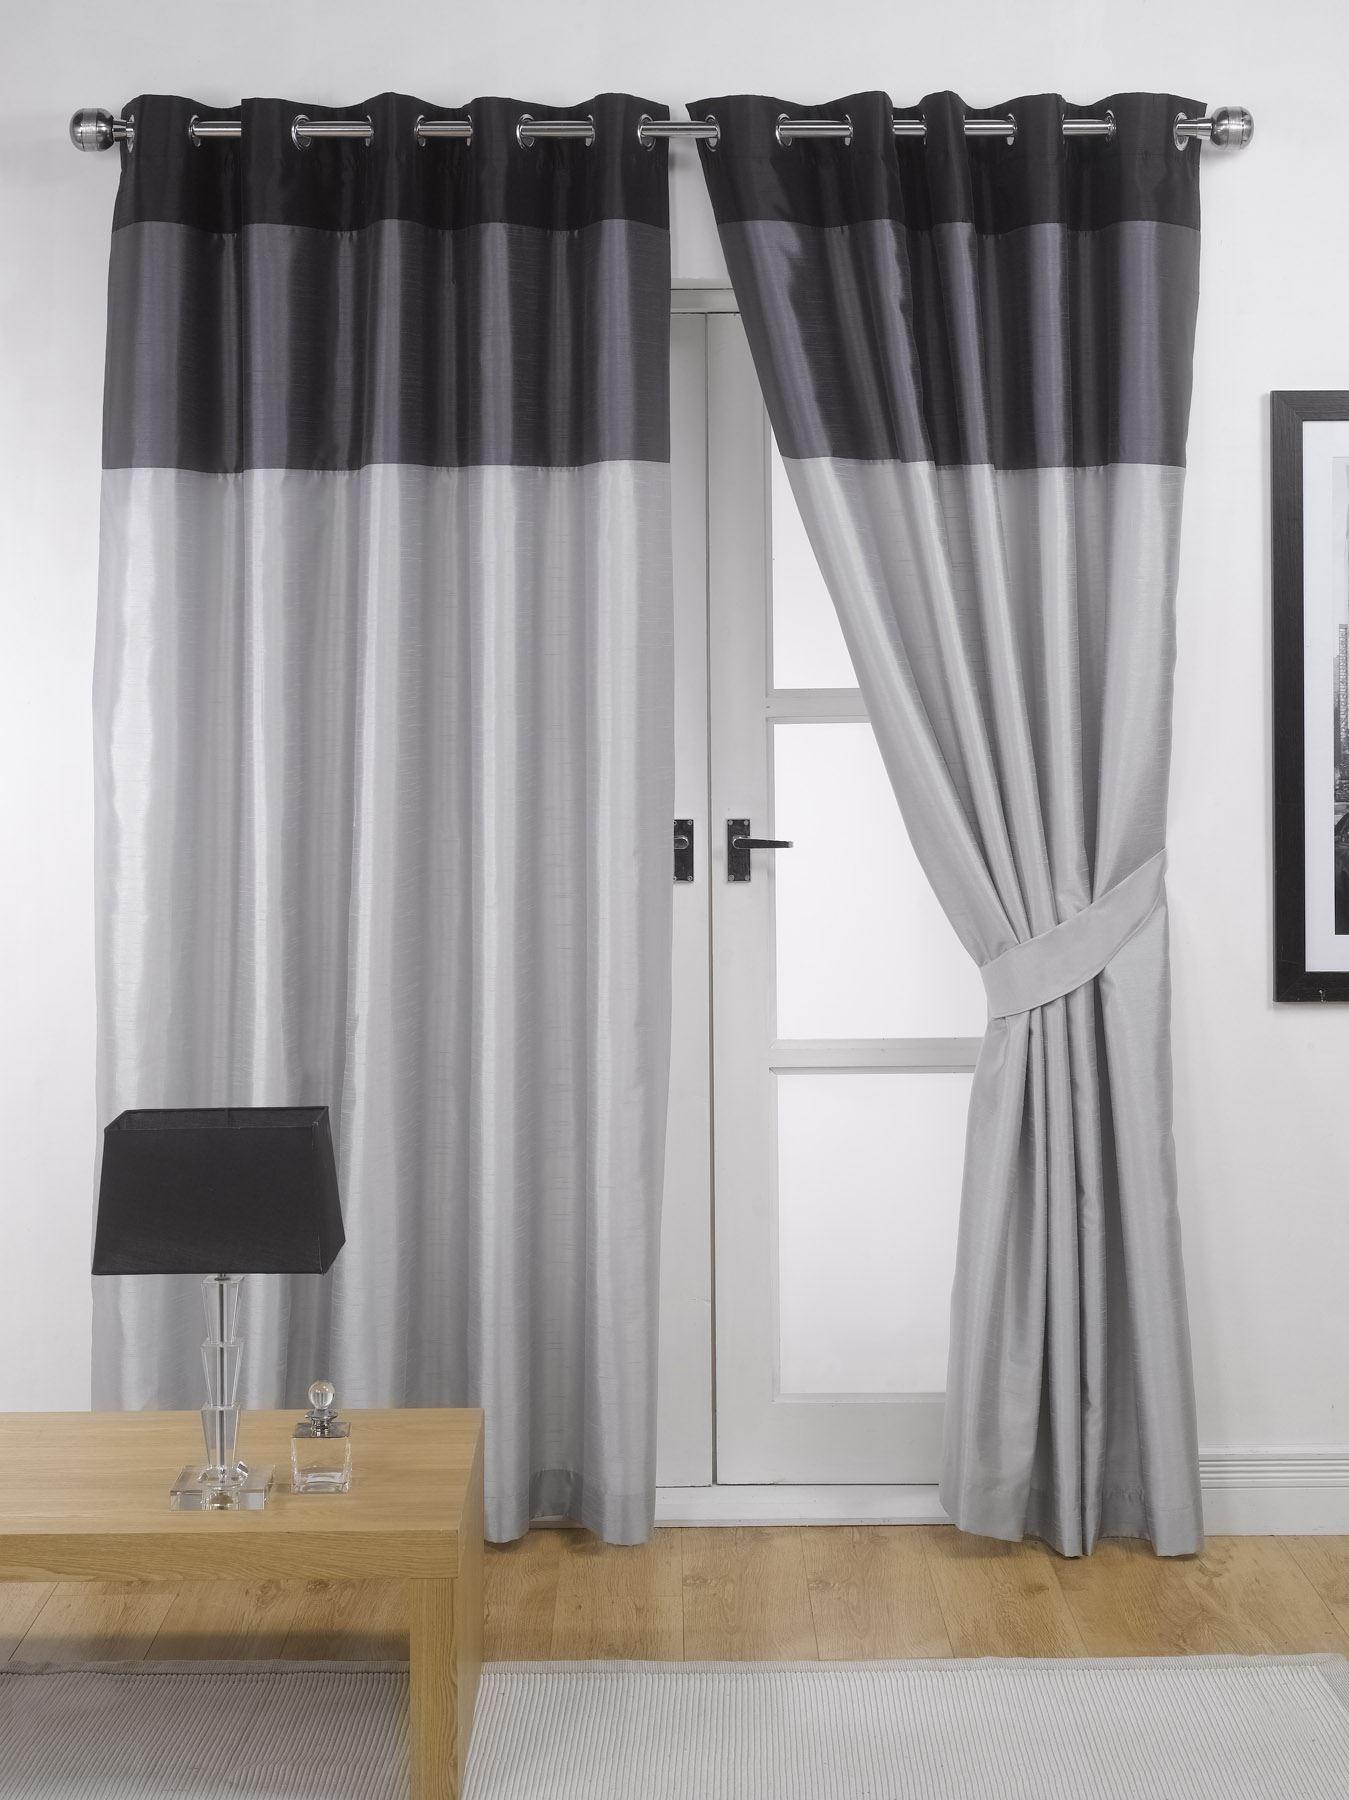 Vienna Lined Eyelet Curtains Ready Made Ringtop Curtain